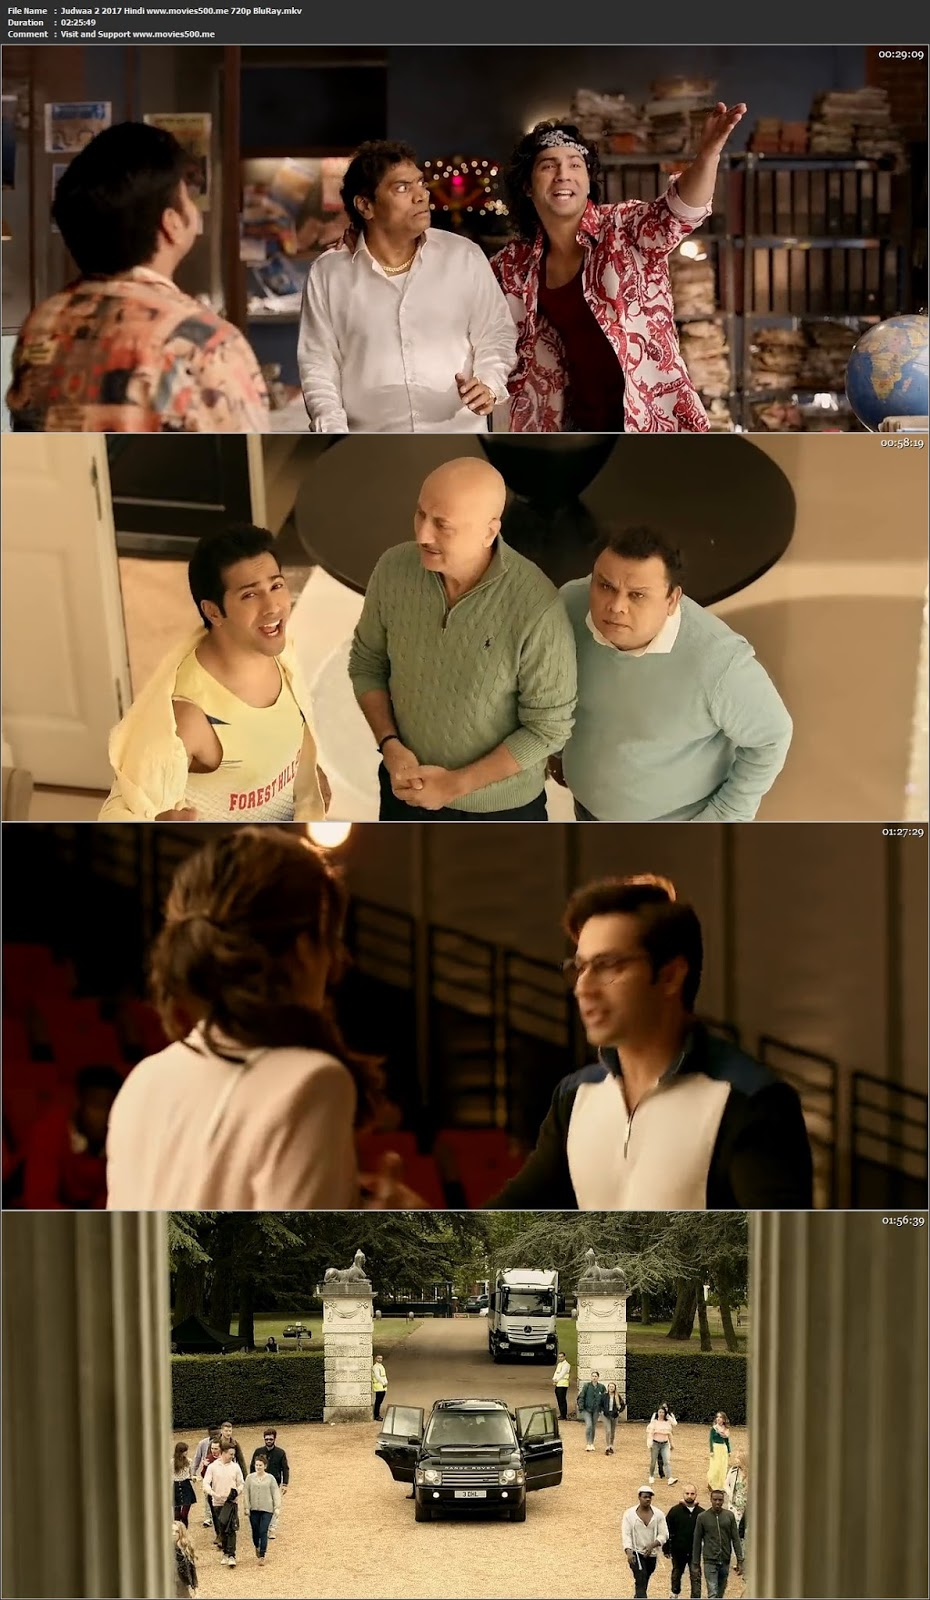 Judwaa 2 2017 Hindi Full Movie BluRay 720p 1GB at witleyapp.com